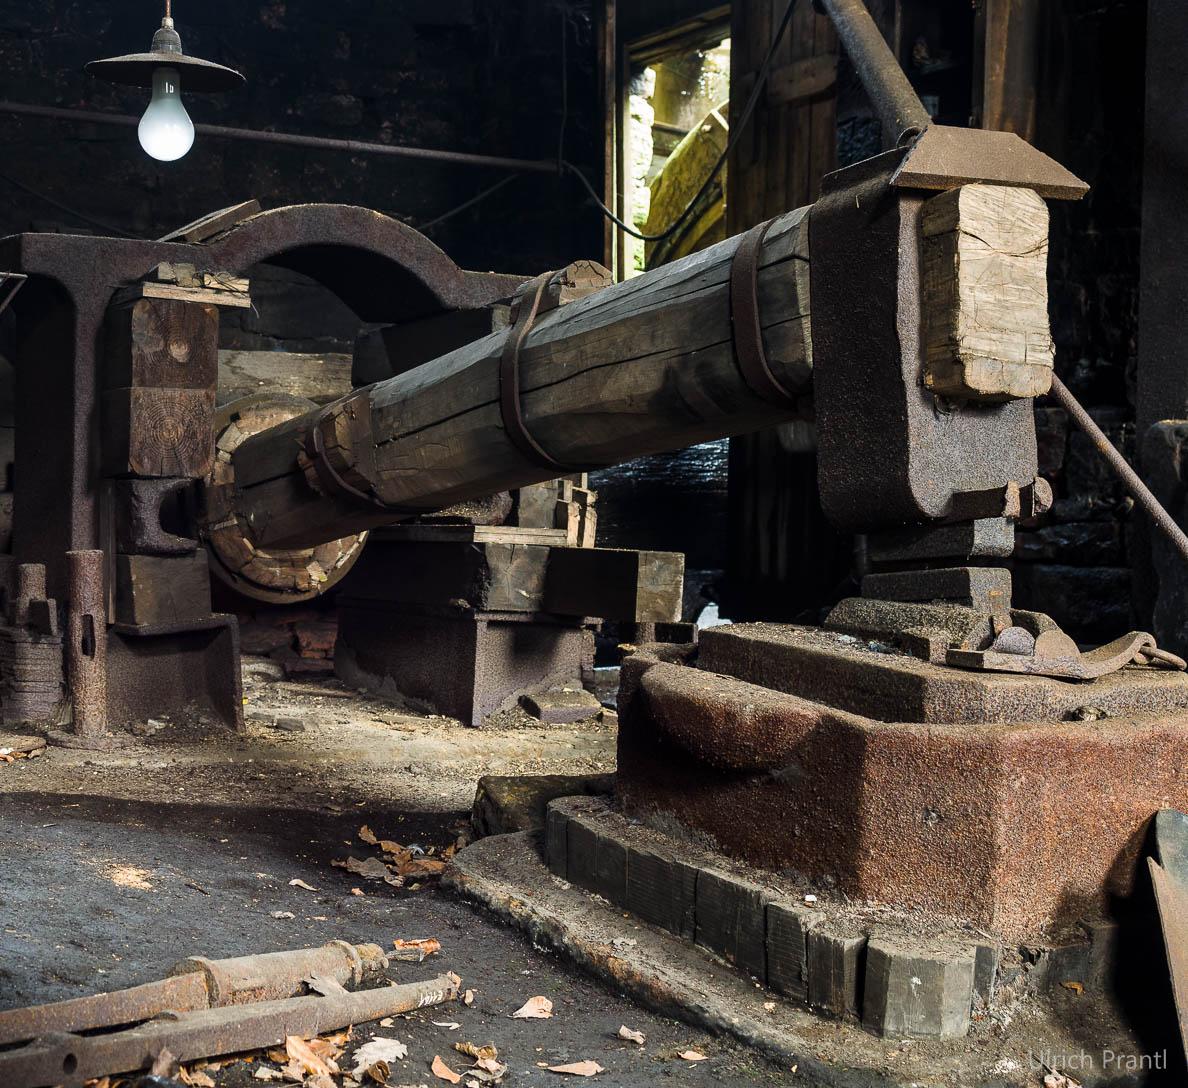 Hasloch Eisenhammer